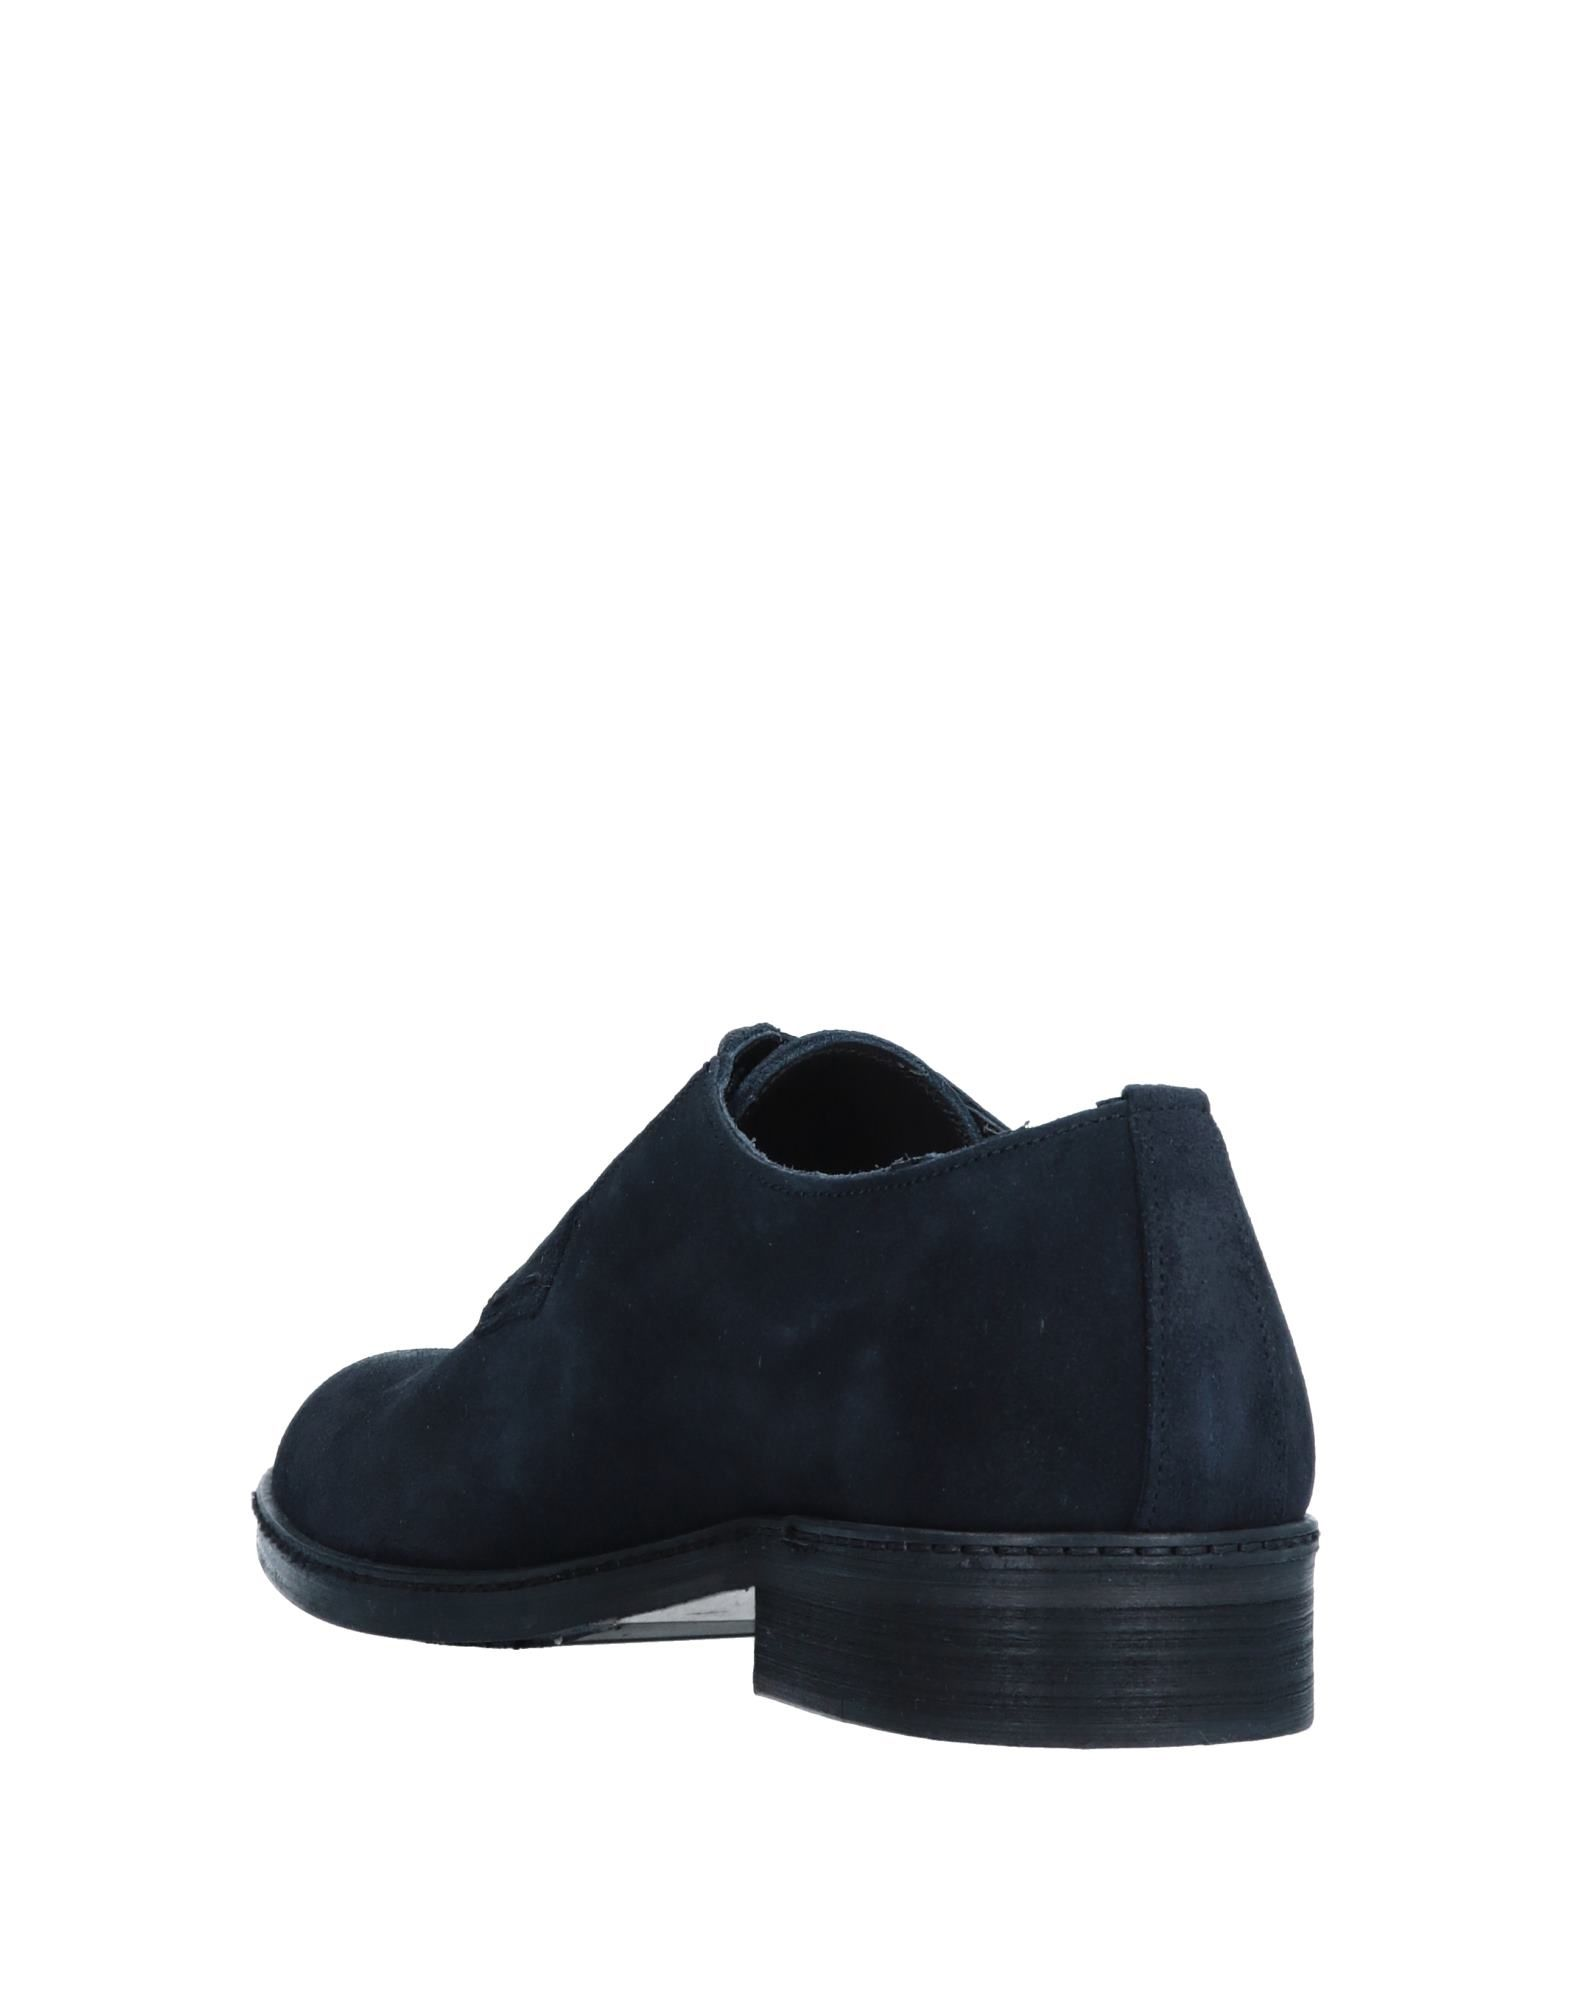 Rabatt echte Schuhe Ton Goût 11556970CE Schnürschuhe Herren  11556970CE Goût bdb13c